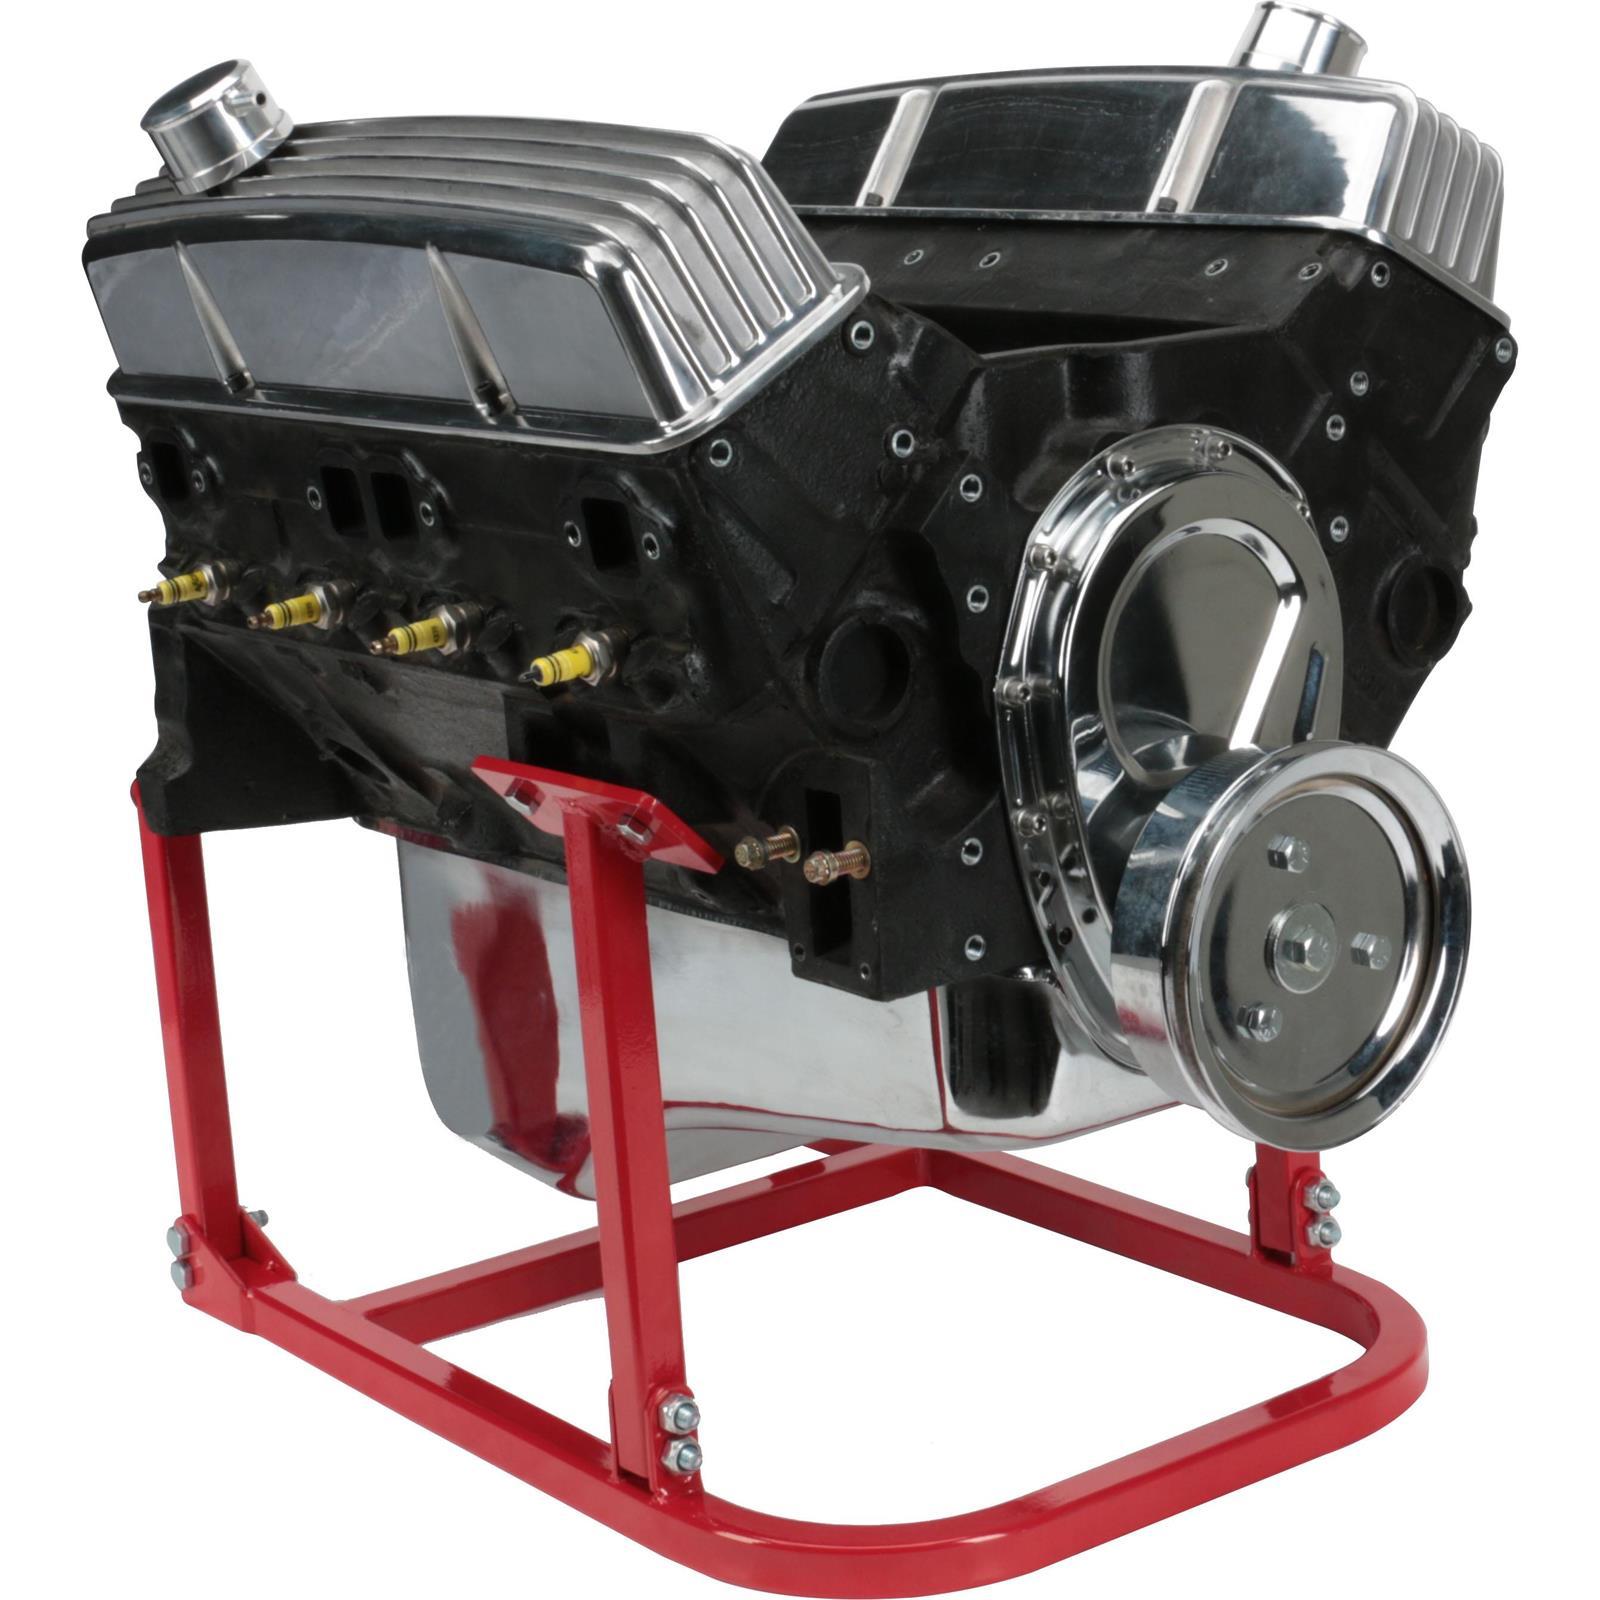 Jaguar 40 V8 Engine Diagrams Install Lifting Brackets Atv Winch – Jaguar 4.0 V8 Engine Diagrams